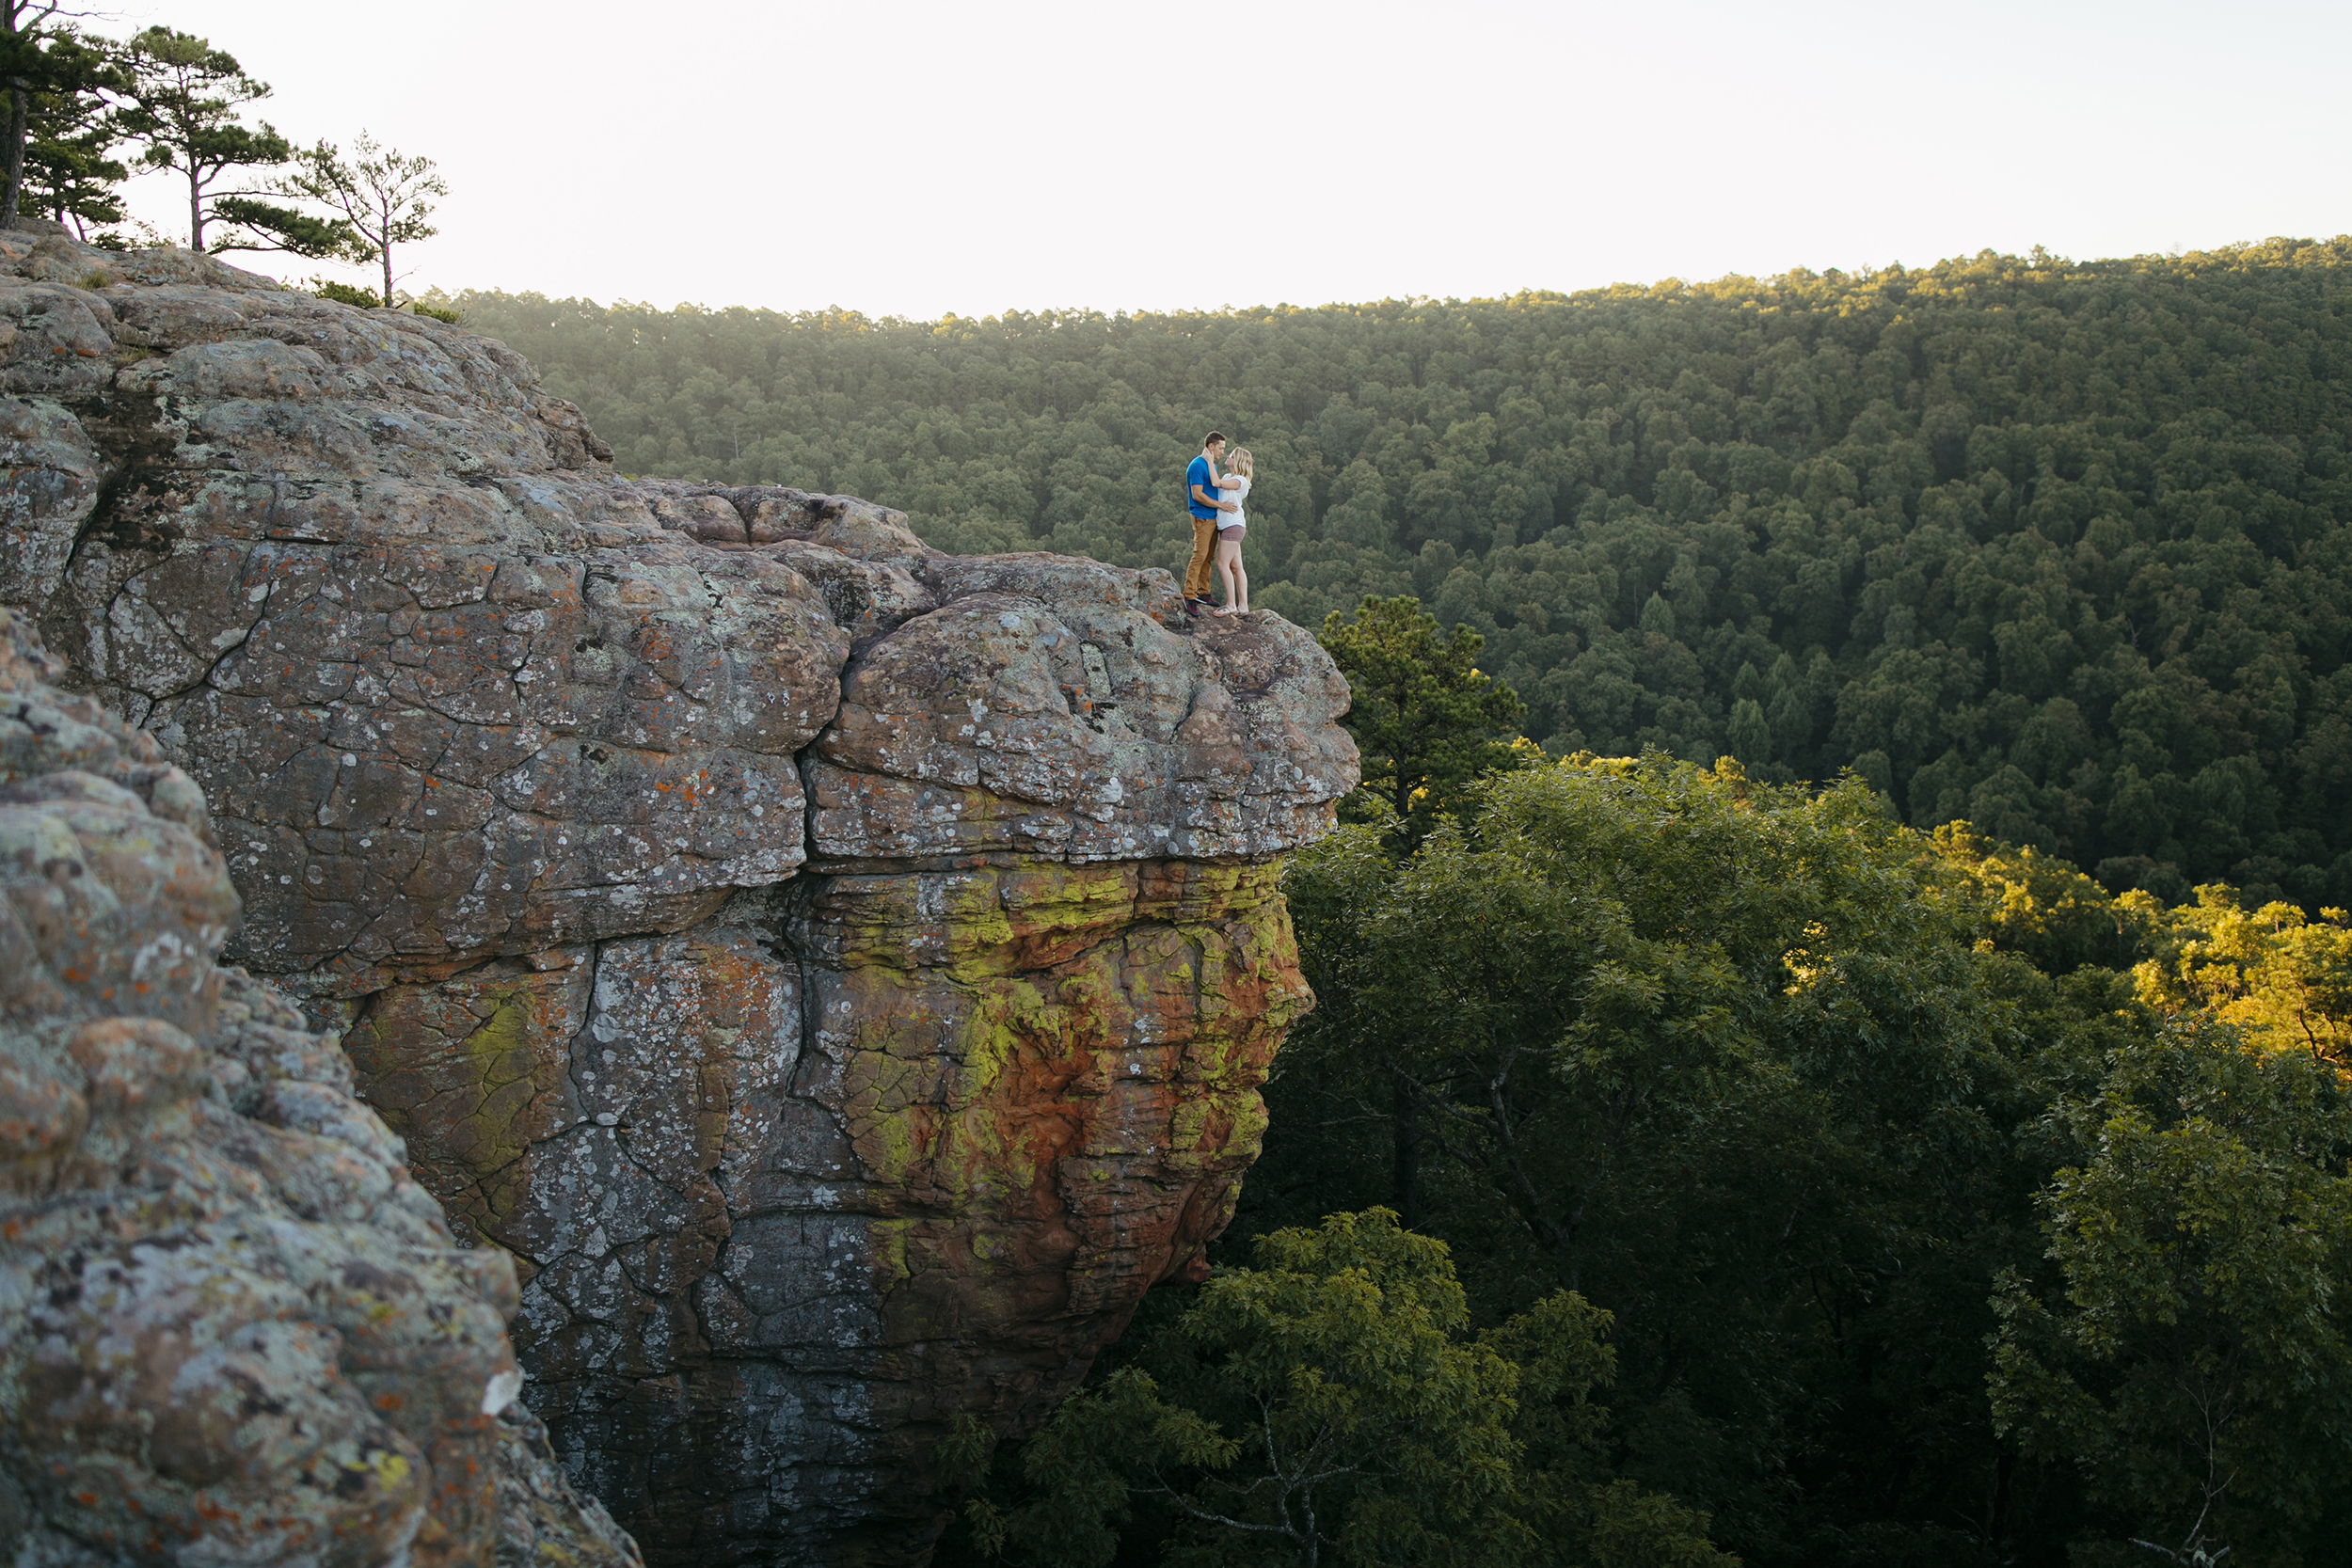 Buffalo-River-Arkansas-Sams-Throne-Adventure-Engagement-Photographer50.JPG